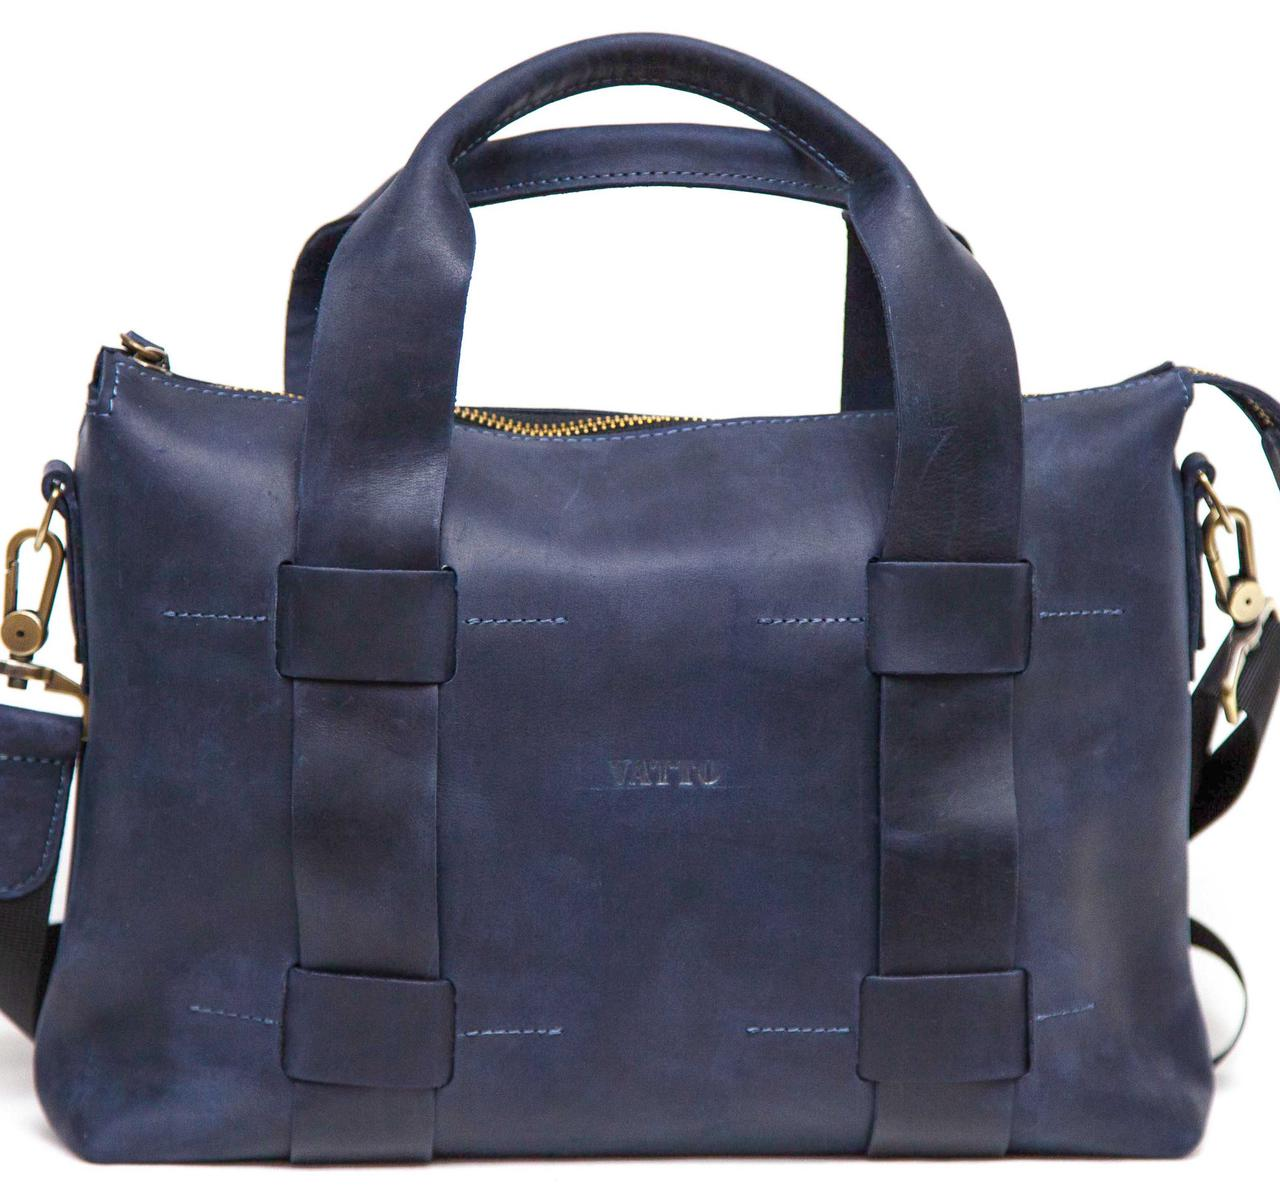 40e258d7 Мужская сумка натуральная кожа синяя: продажа, цена в Днепре ...